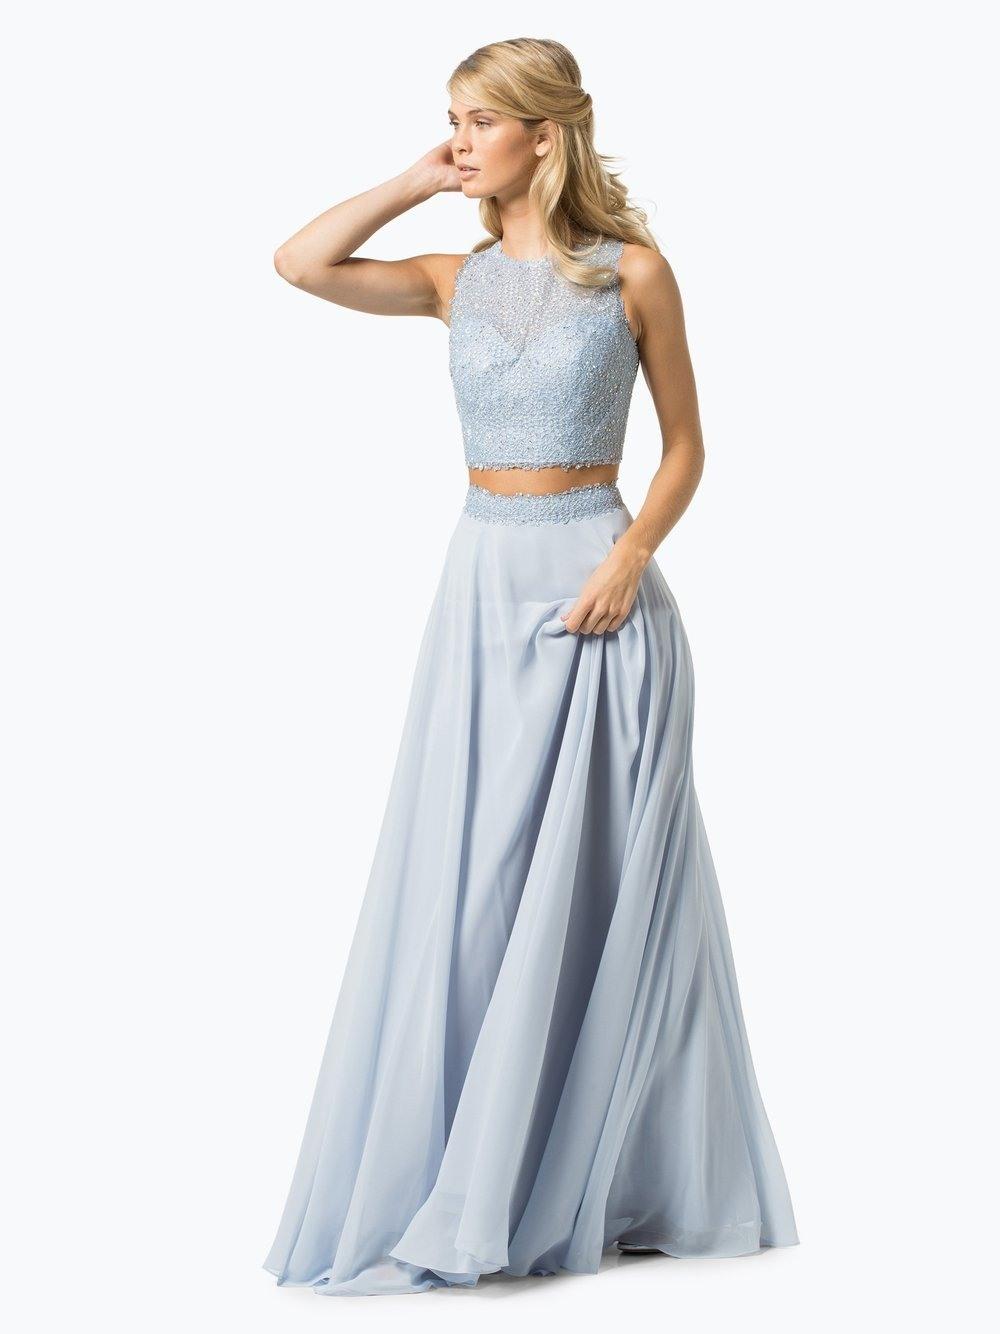 Formal Schön Langes Abendkleid Kreuzworträtsel Bester Preis13 Elegant Langes Abendkleid Kreuzworträtsel Boutique